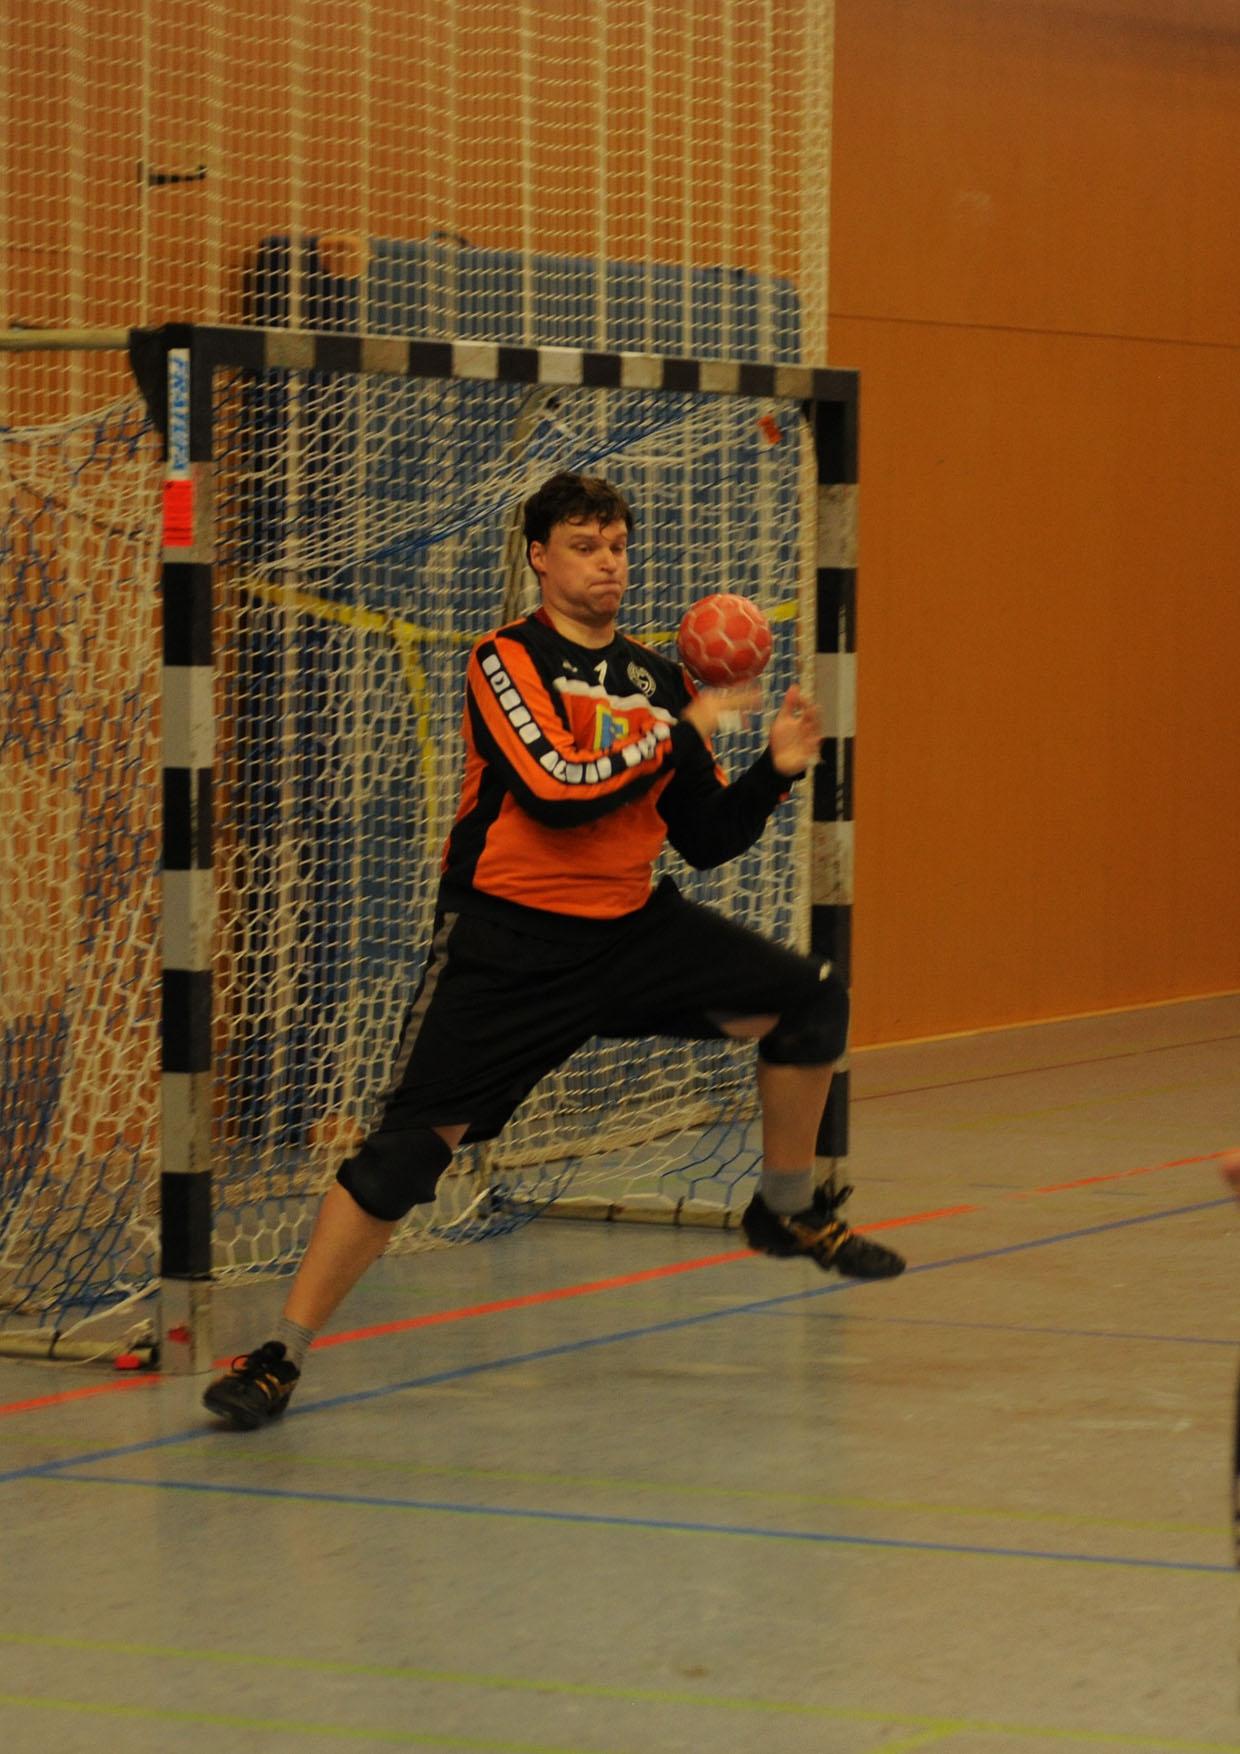 Sportfotografie - PR Photo